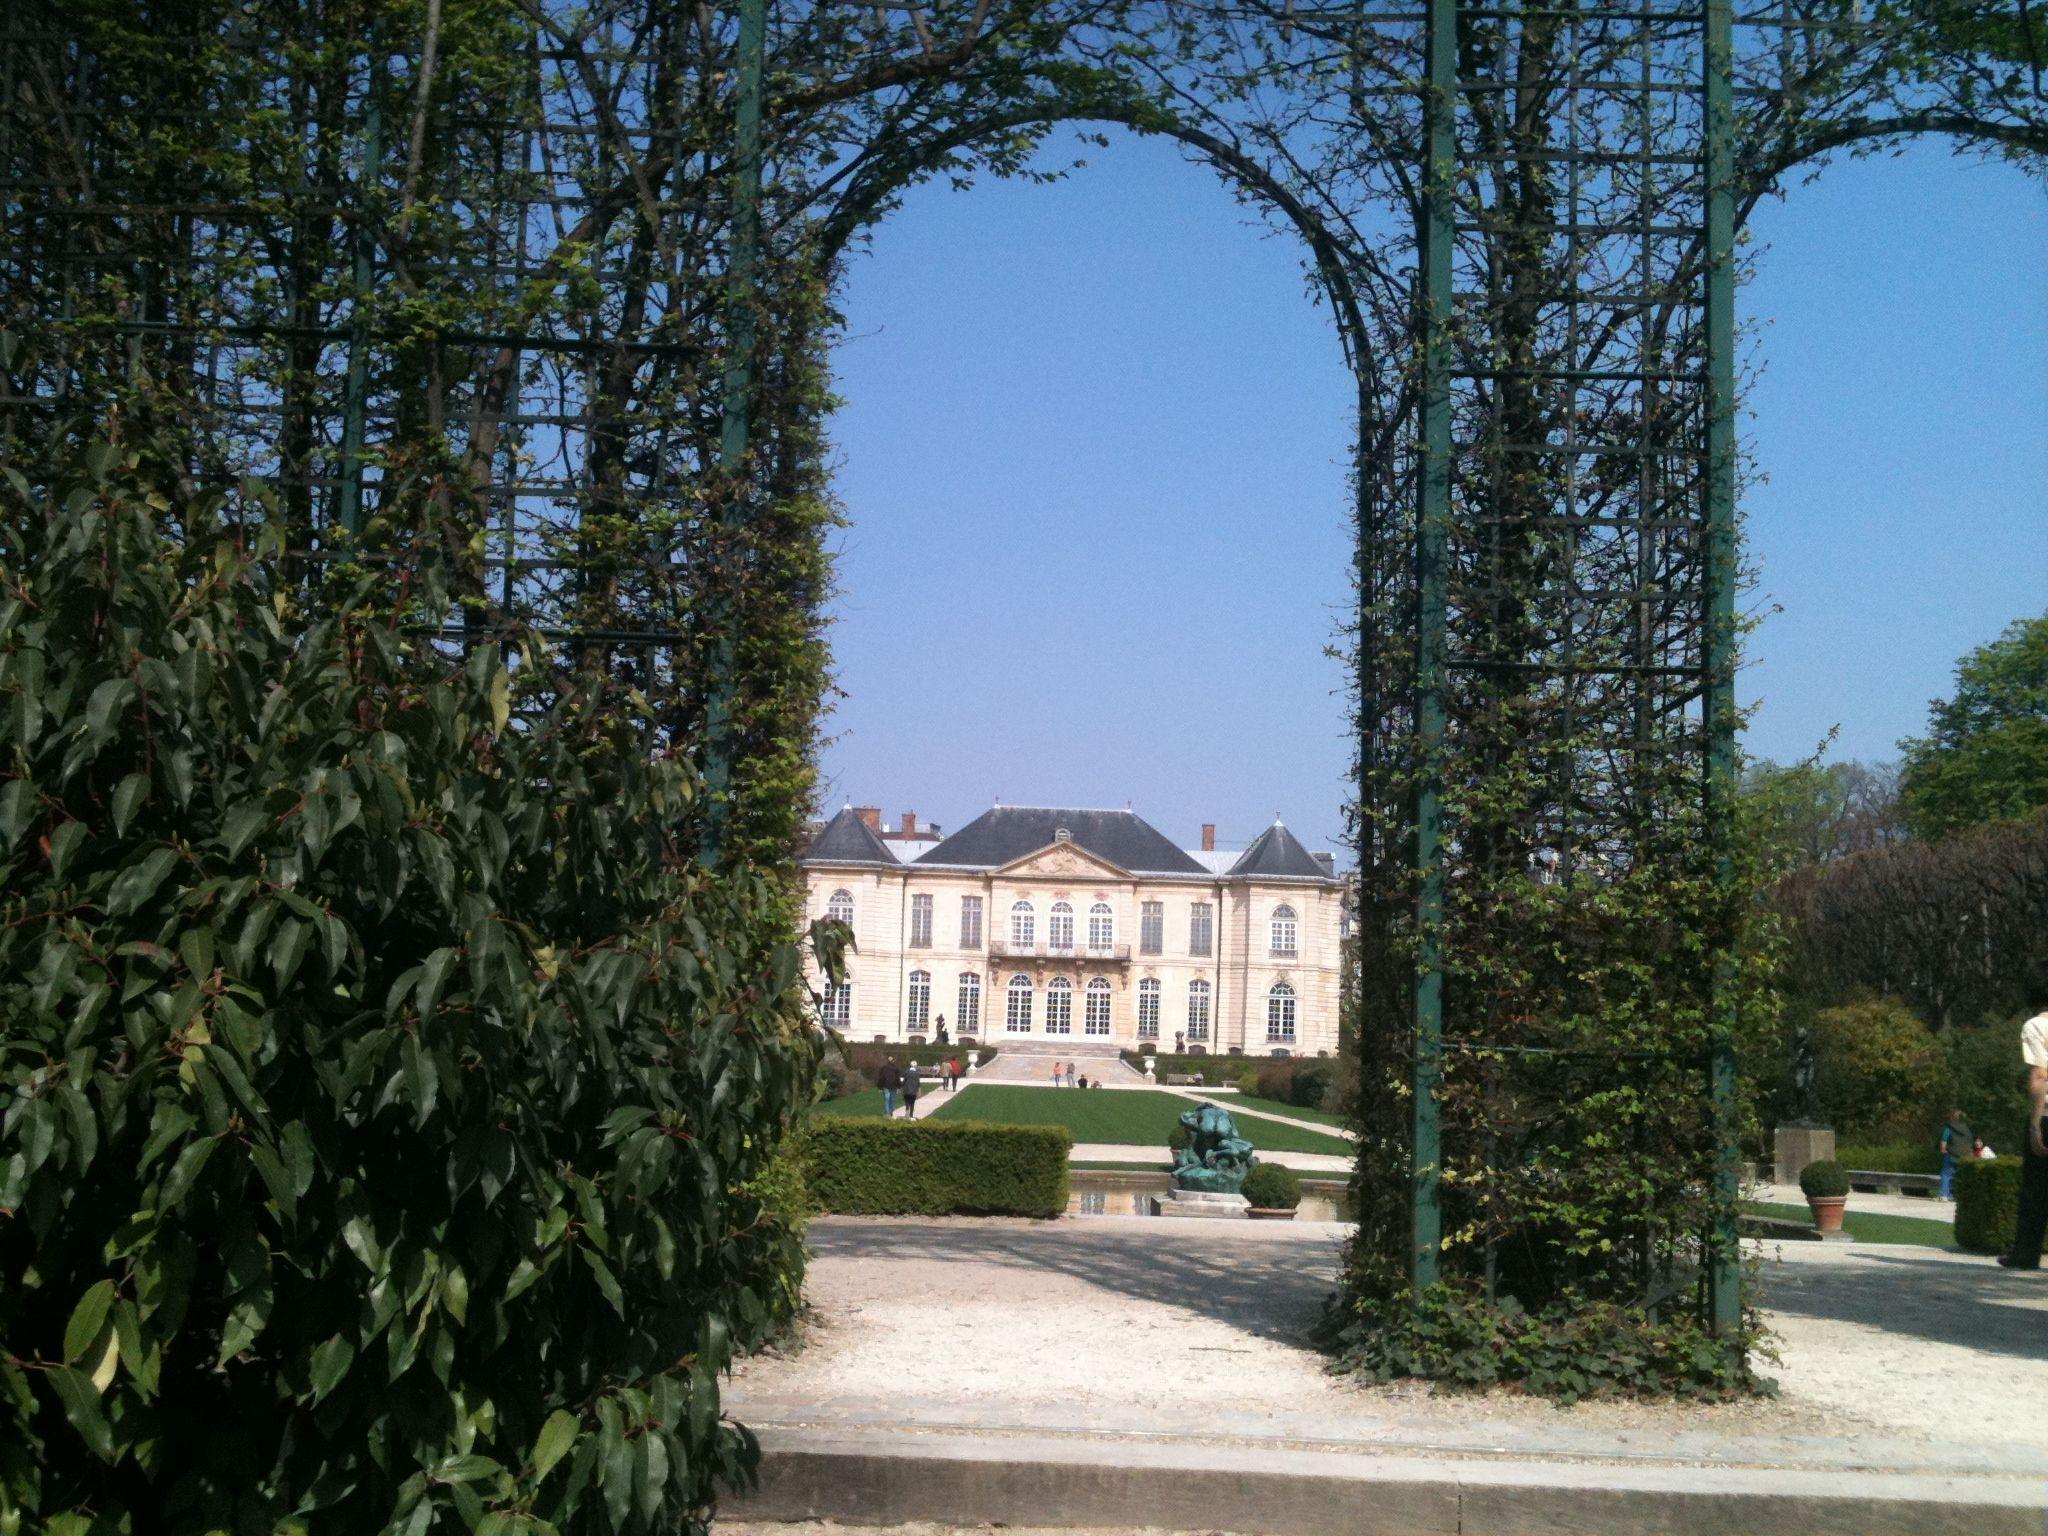 gardens musee rodin - Google Search